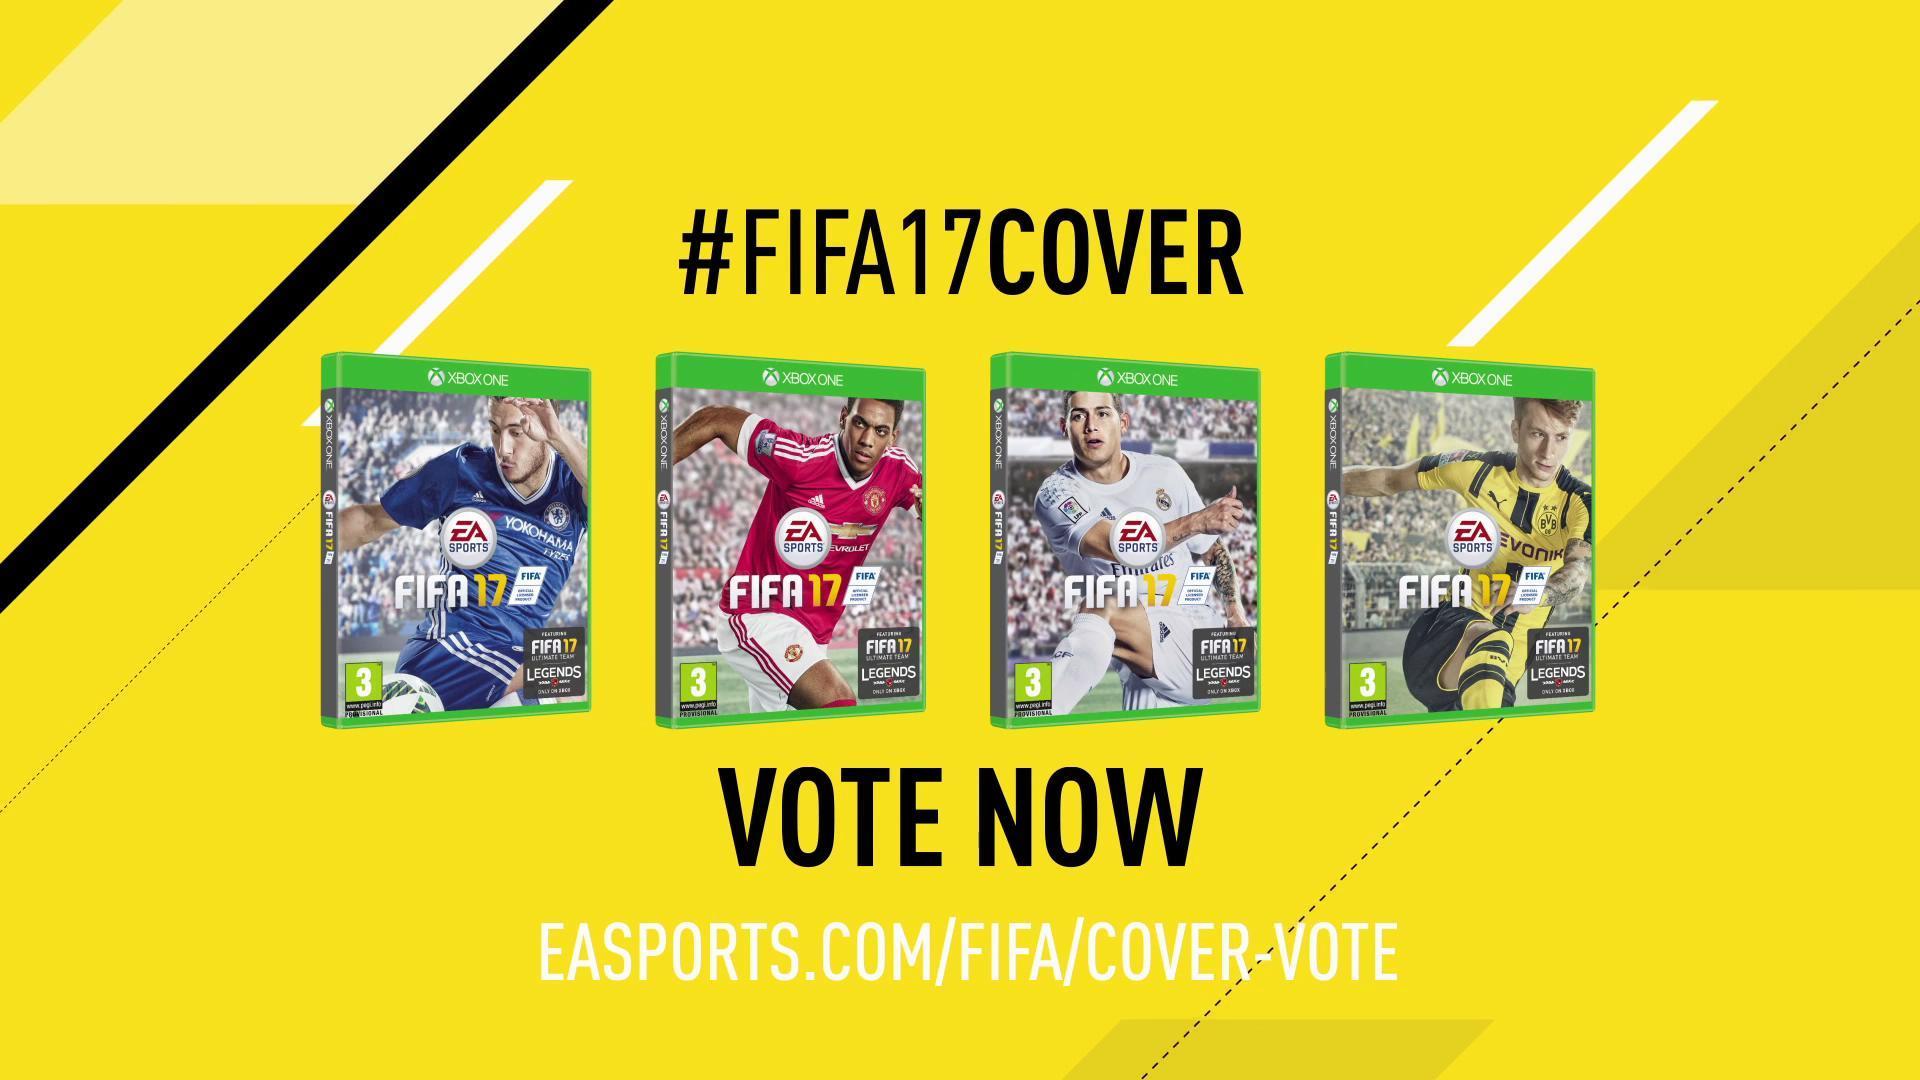 《FIFA 17》封面球星票选正式上线